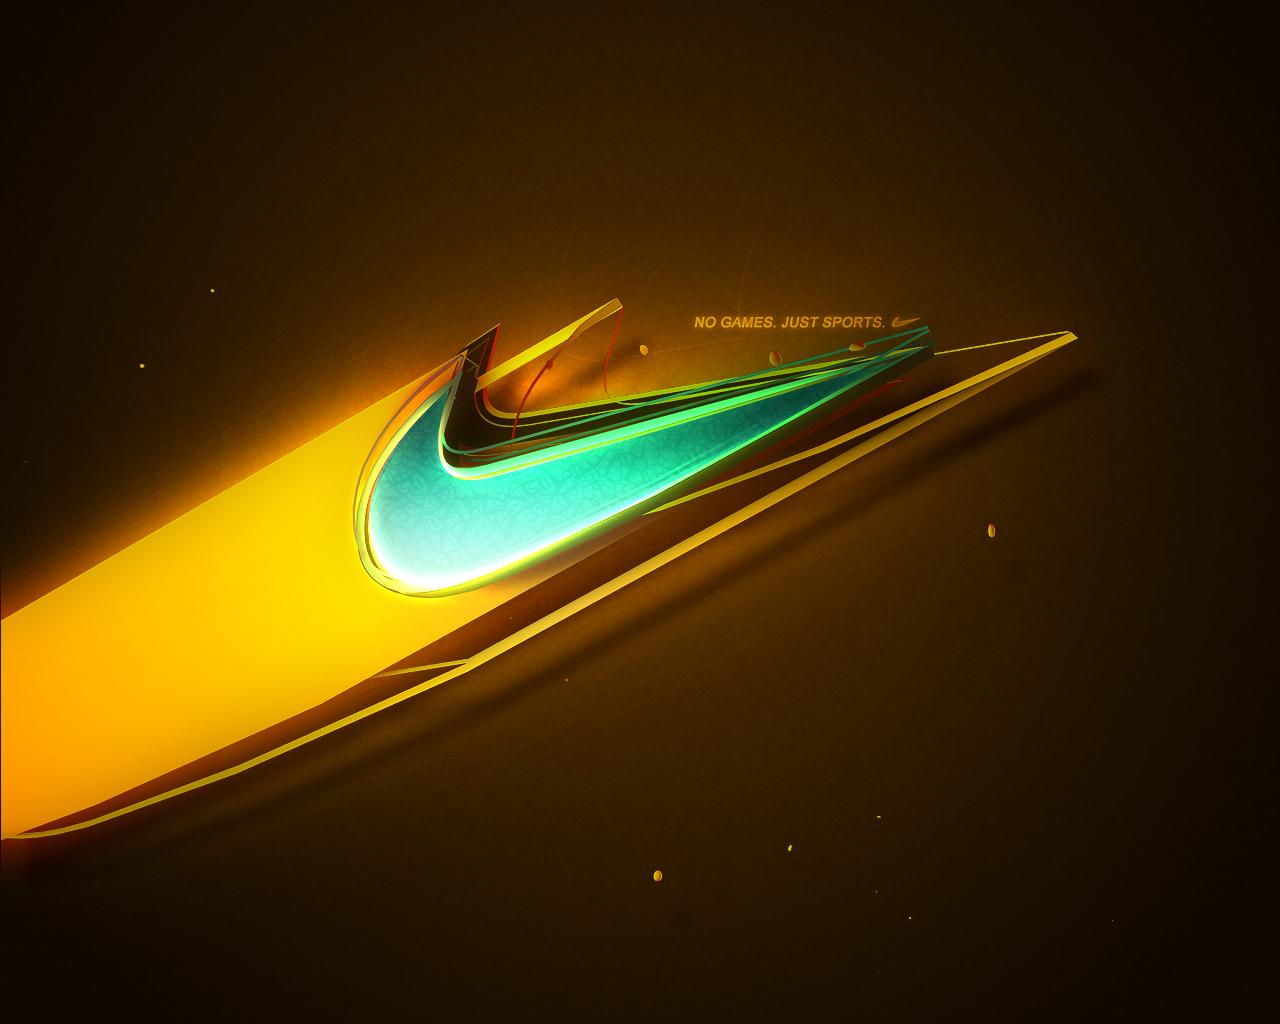 Nike Wallpaper Backgrounds 1280x1024